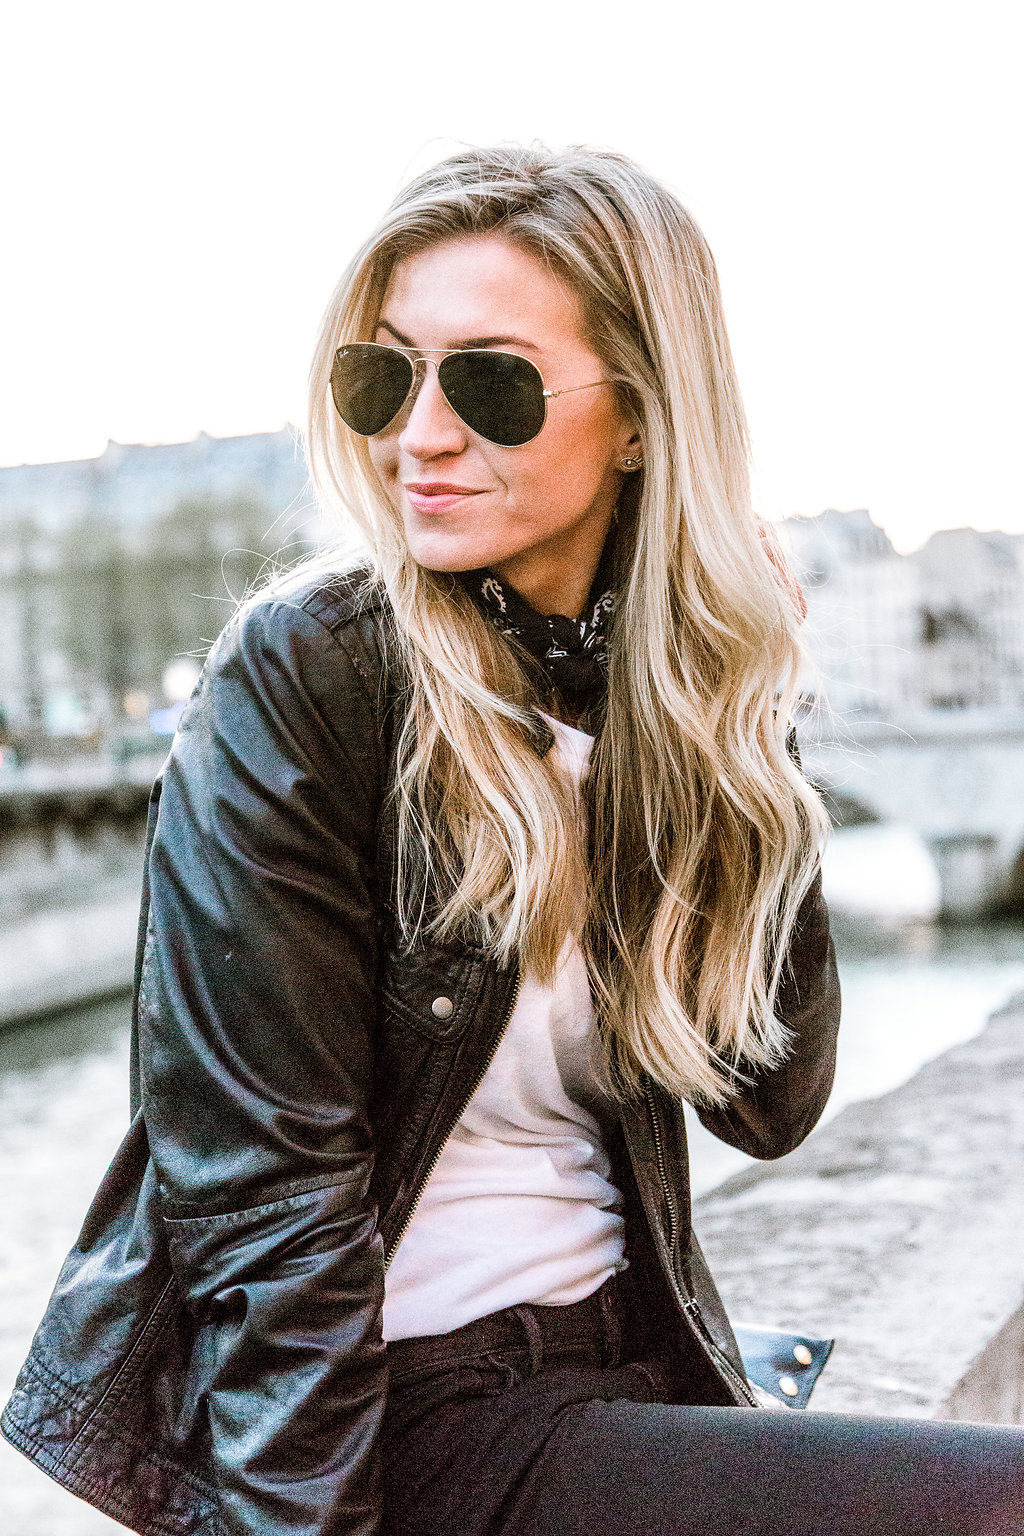 Parisian chic: Black + white + necktie,